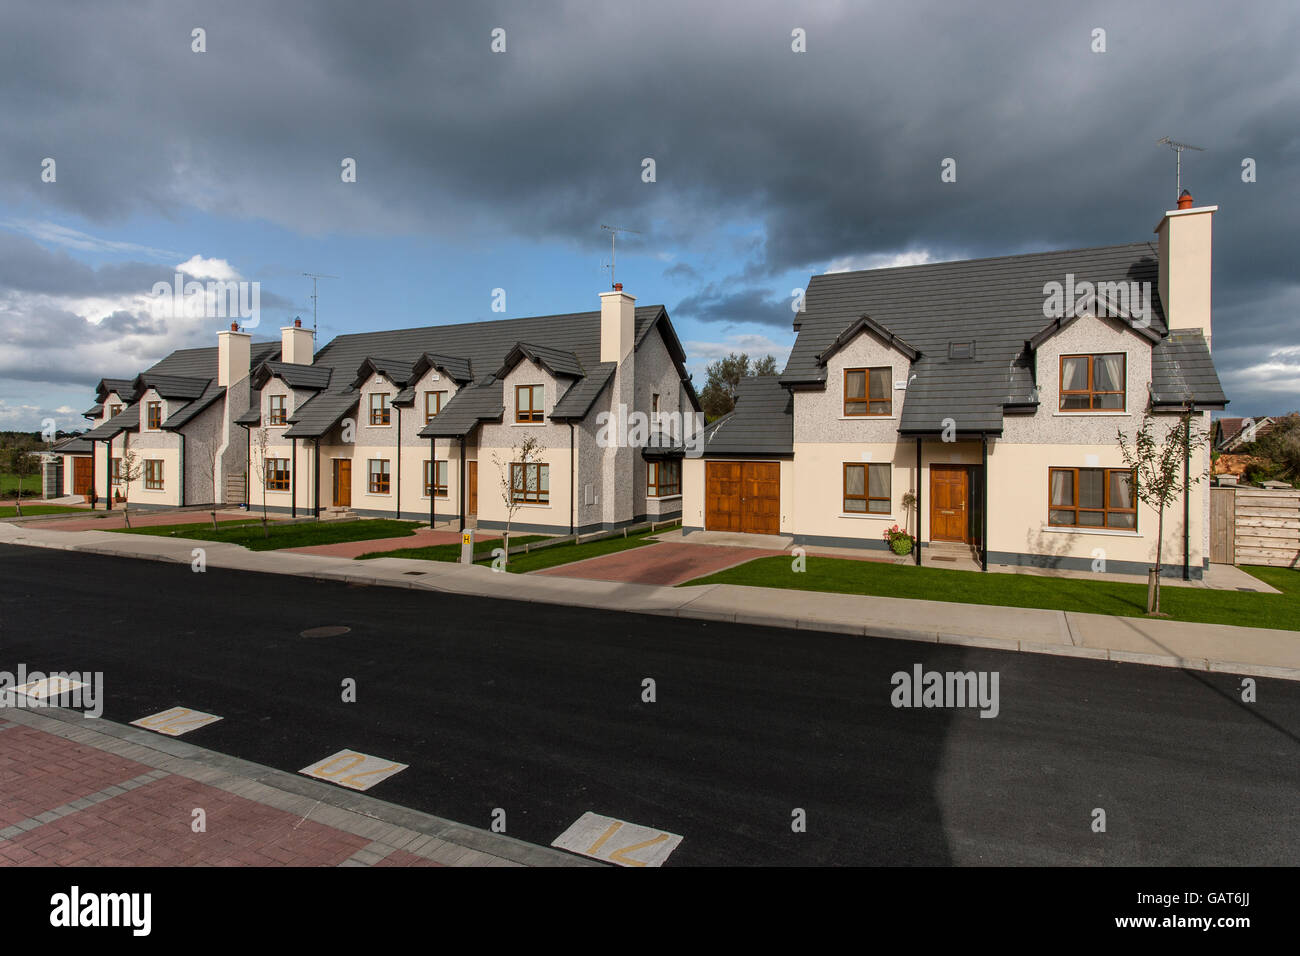 Häuser vor kurzem abgeschlossene Zeile neue Gehäuse Europa Stockbild